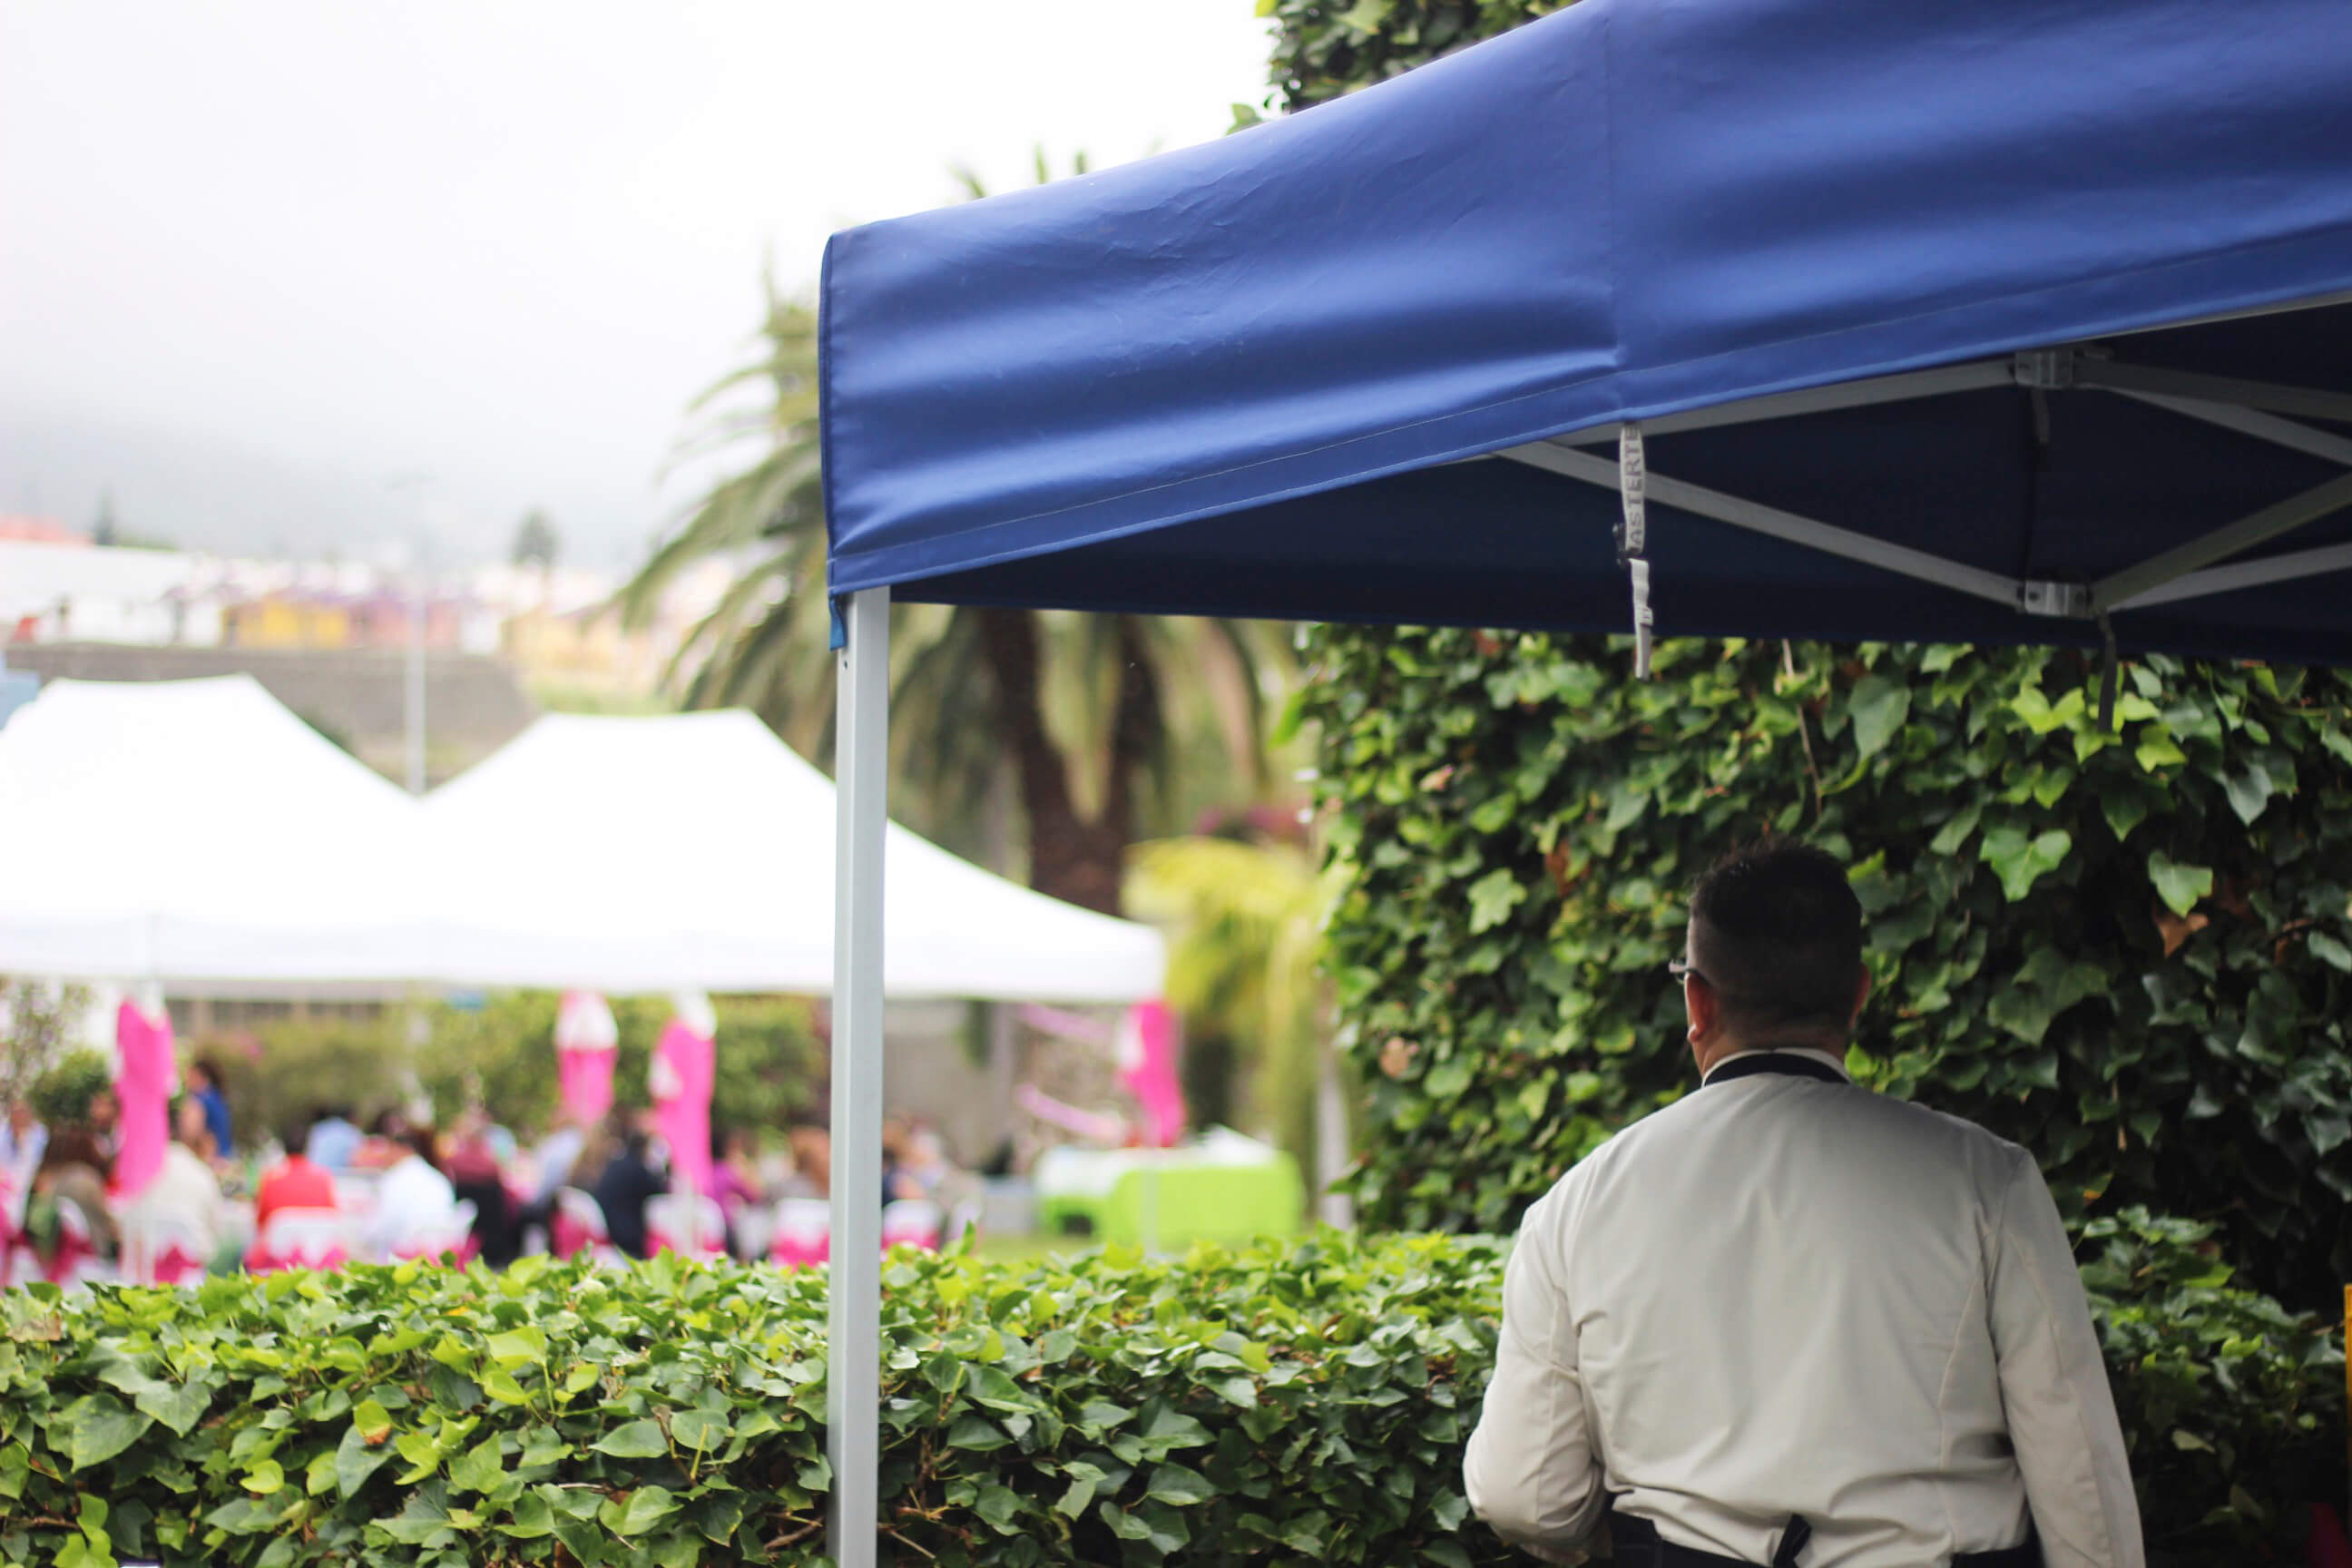 Tasca Sansofé comer bien en Tenerife 2018